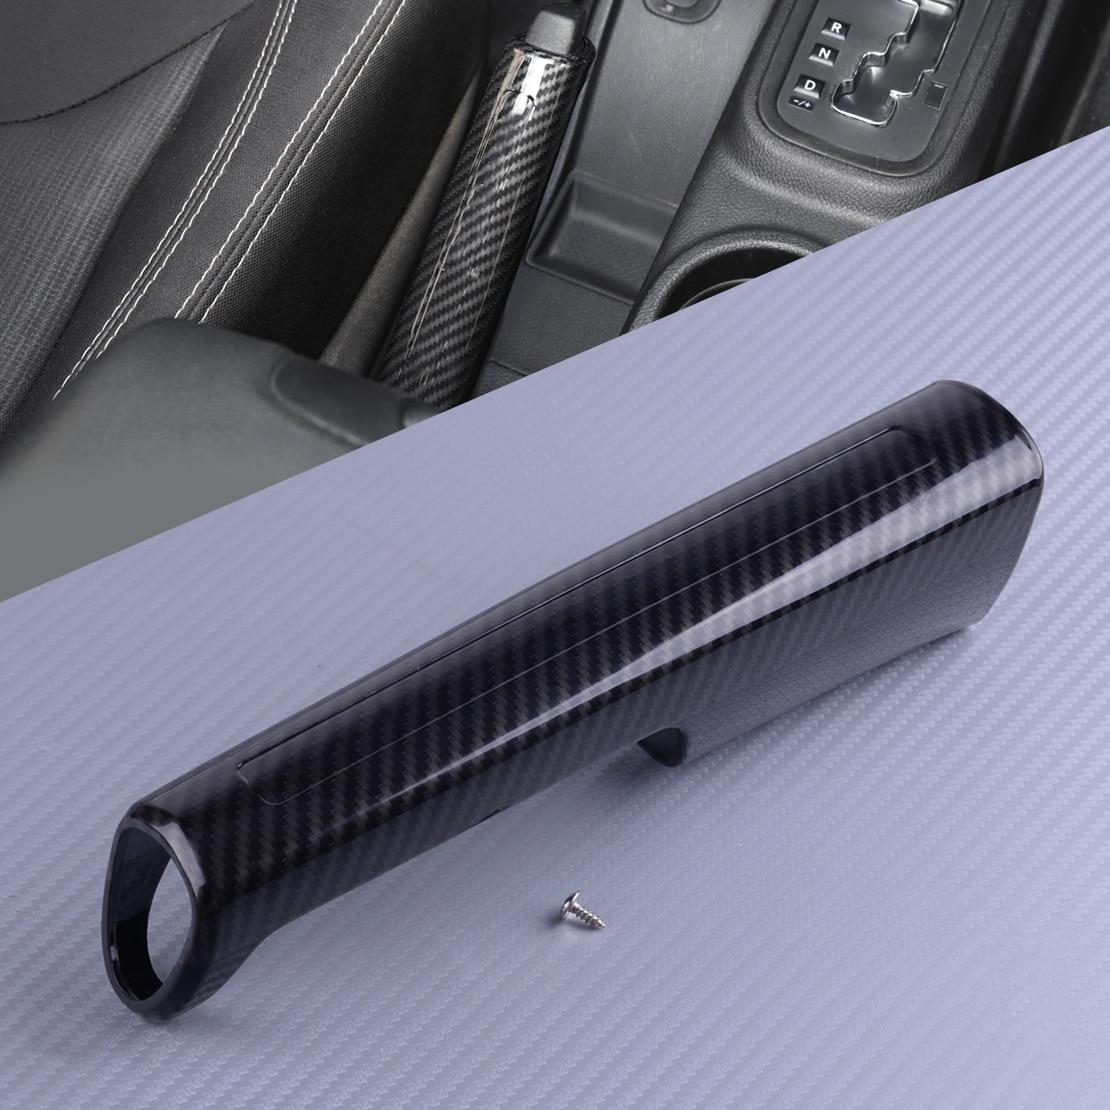 DWCX ABS Carbon Fiber Texture Handbrake Hand Brake Trim Cover Fit For Jeep Wrangler JK 2007-2011 2012 2013 2014 2015 2016 2017